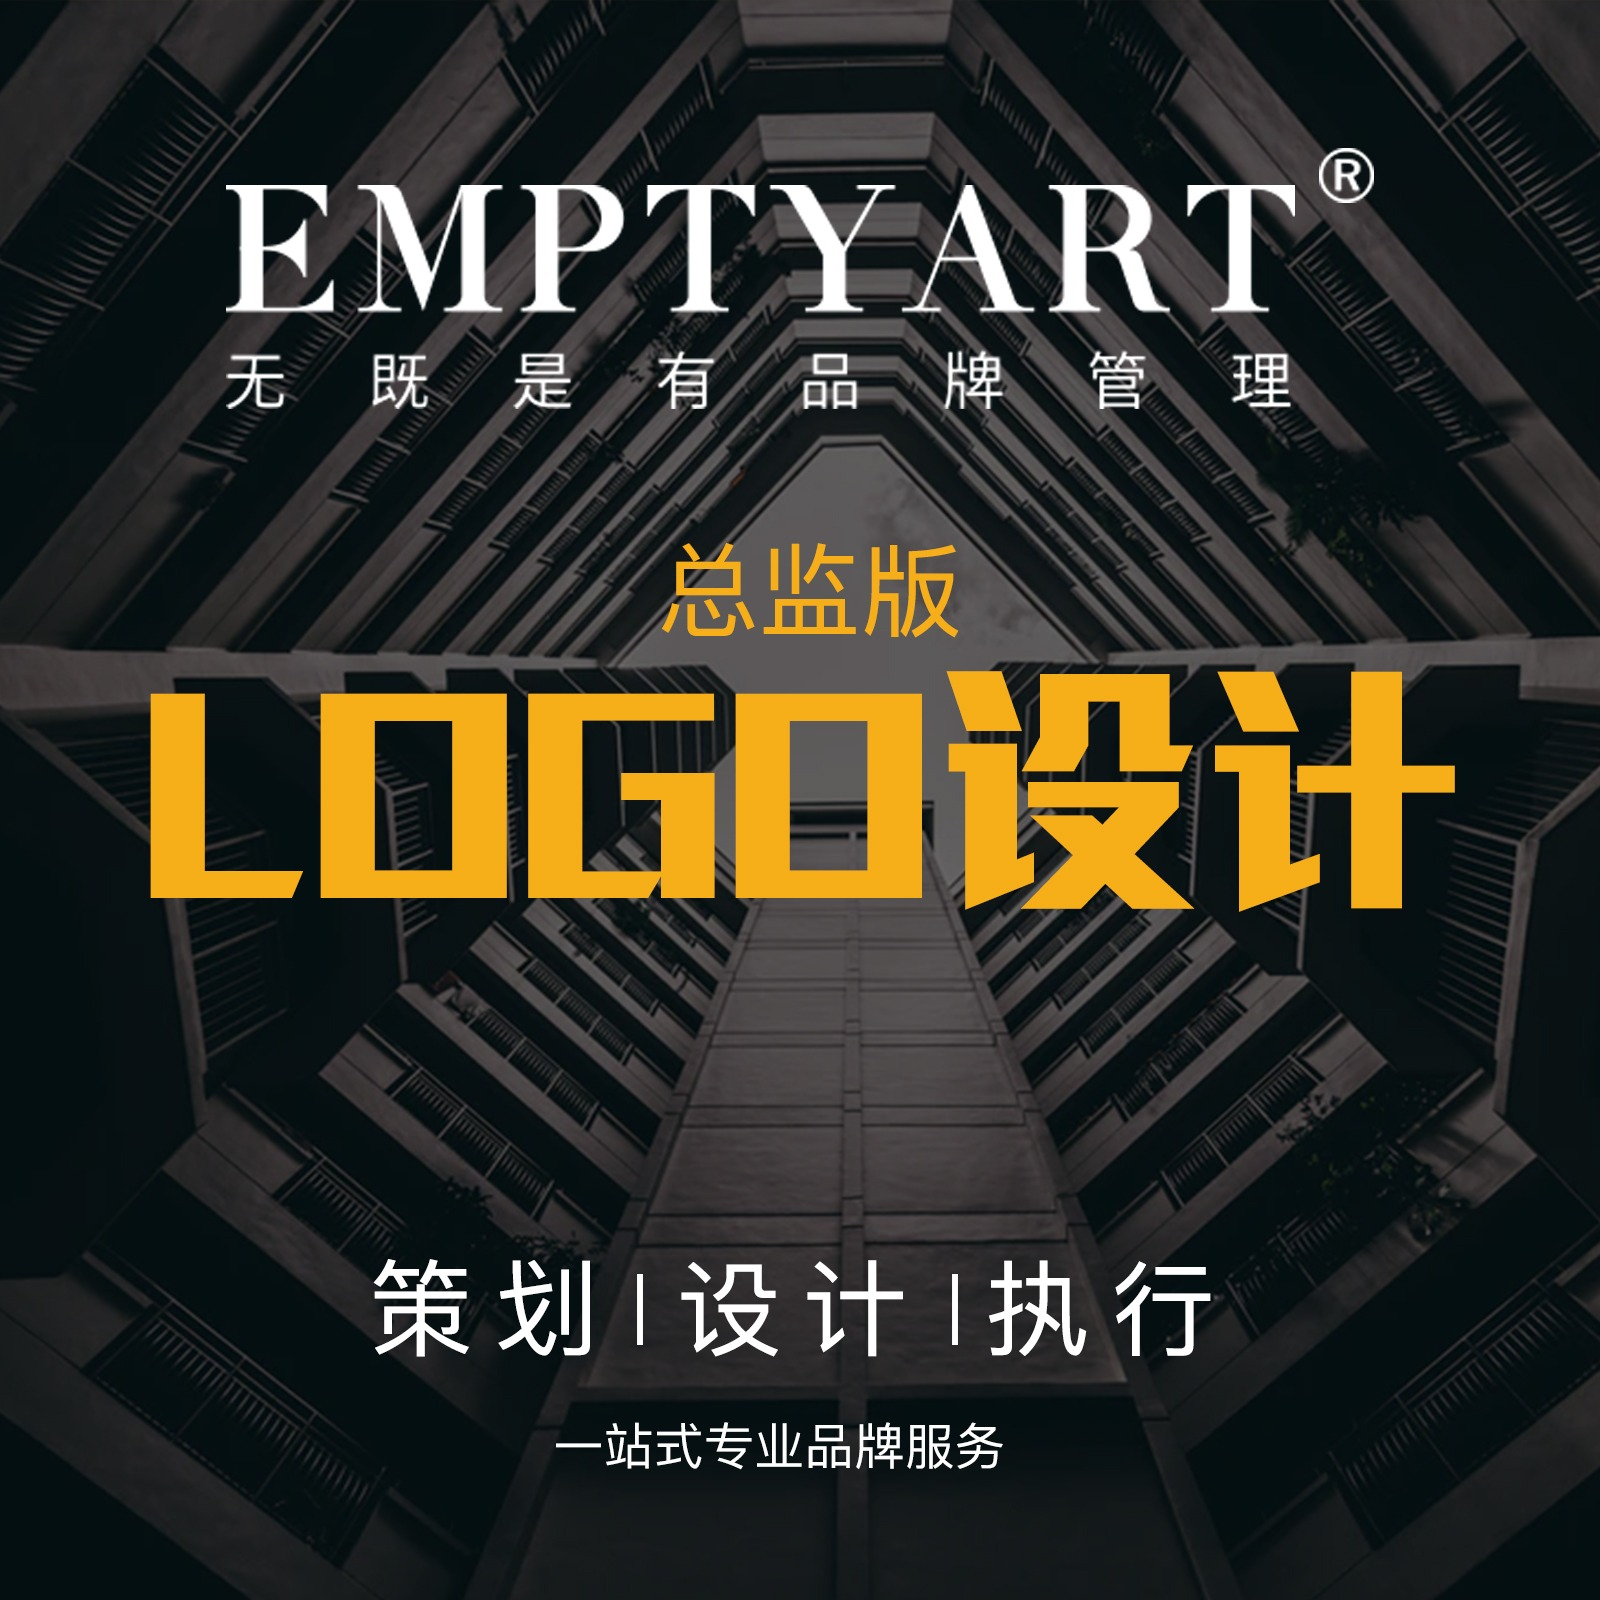 总监版品牌<hl>logo设计</hl>原创标志商标<hl>LOGO</hl>图标